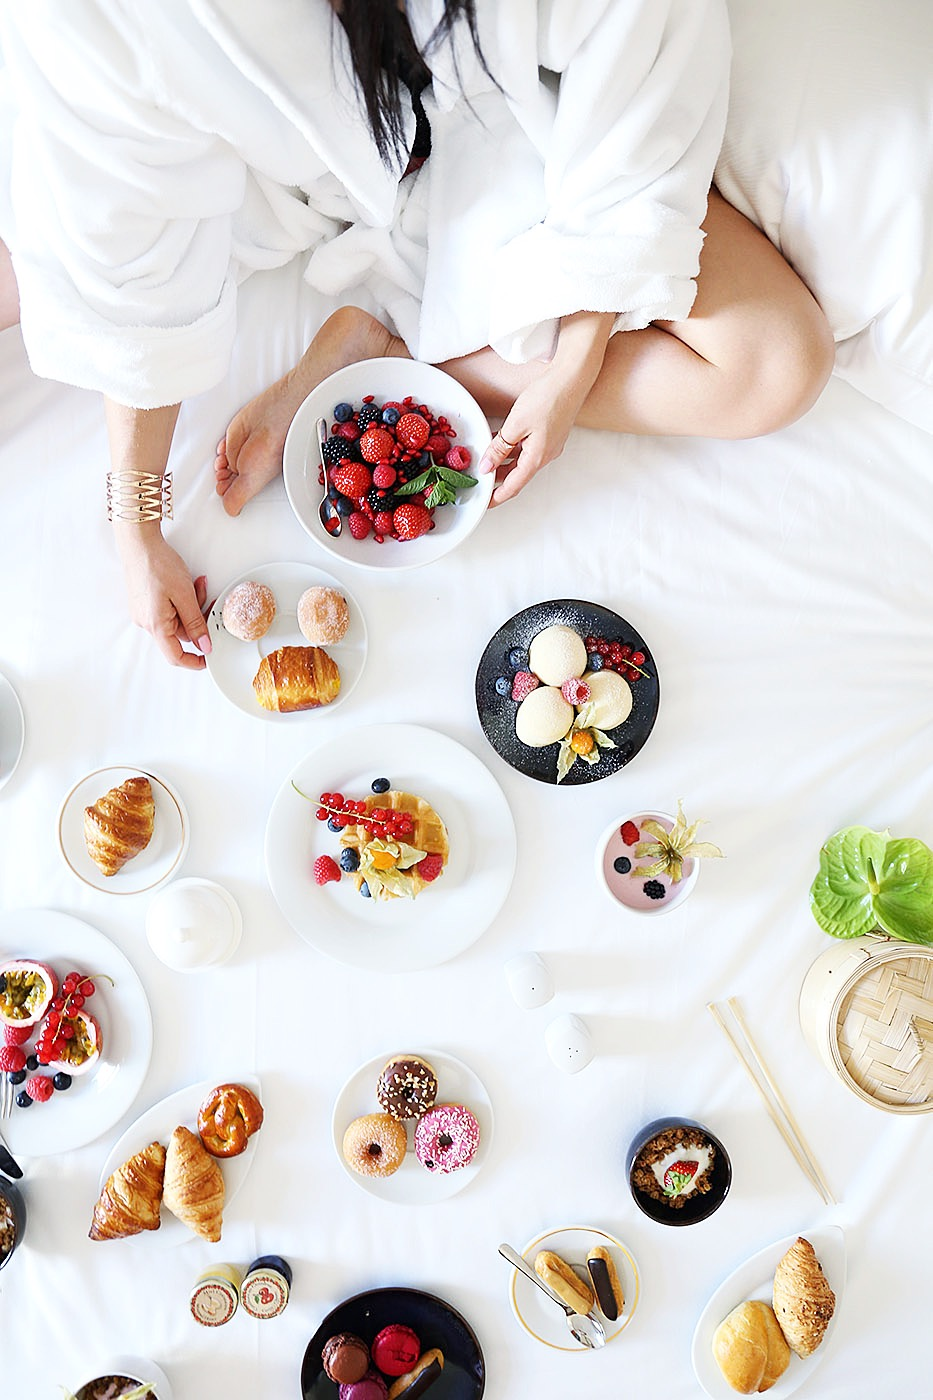 Breakfast in bed at KEMPINSKI GRAND HÔTEL DES BAINS - ST. MORITZ